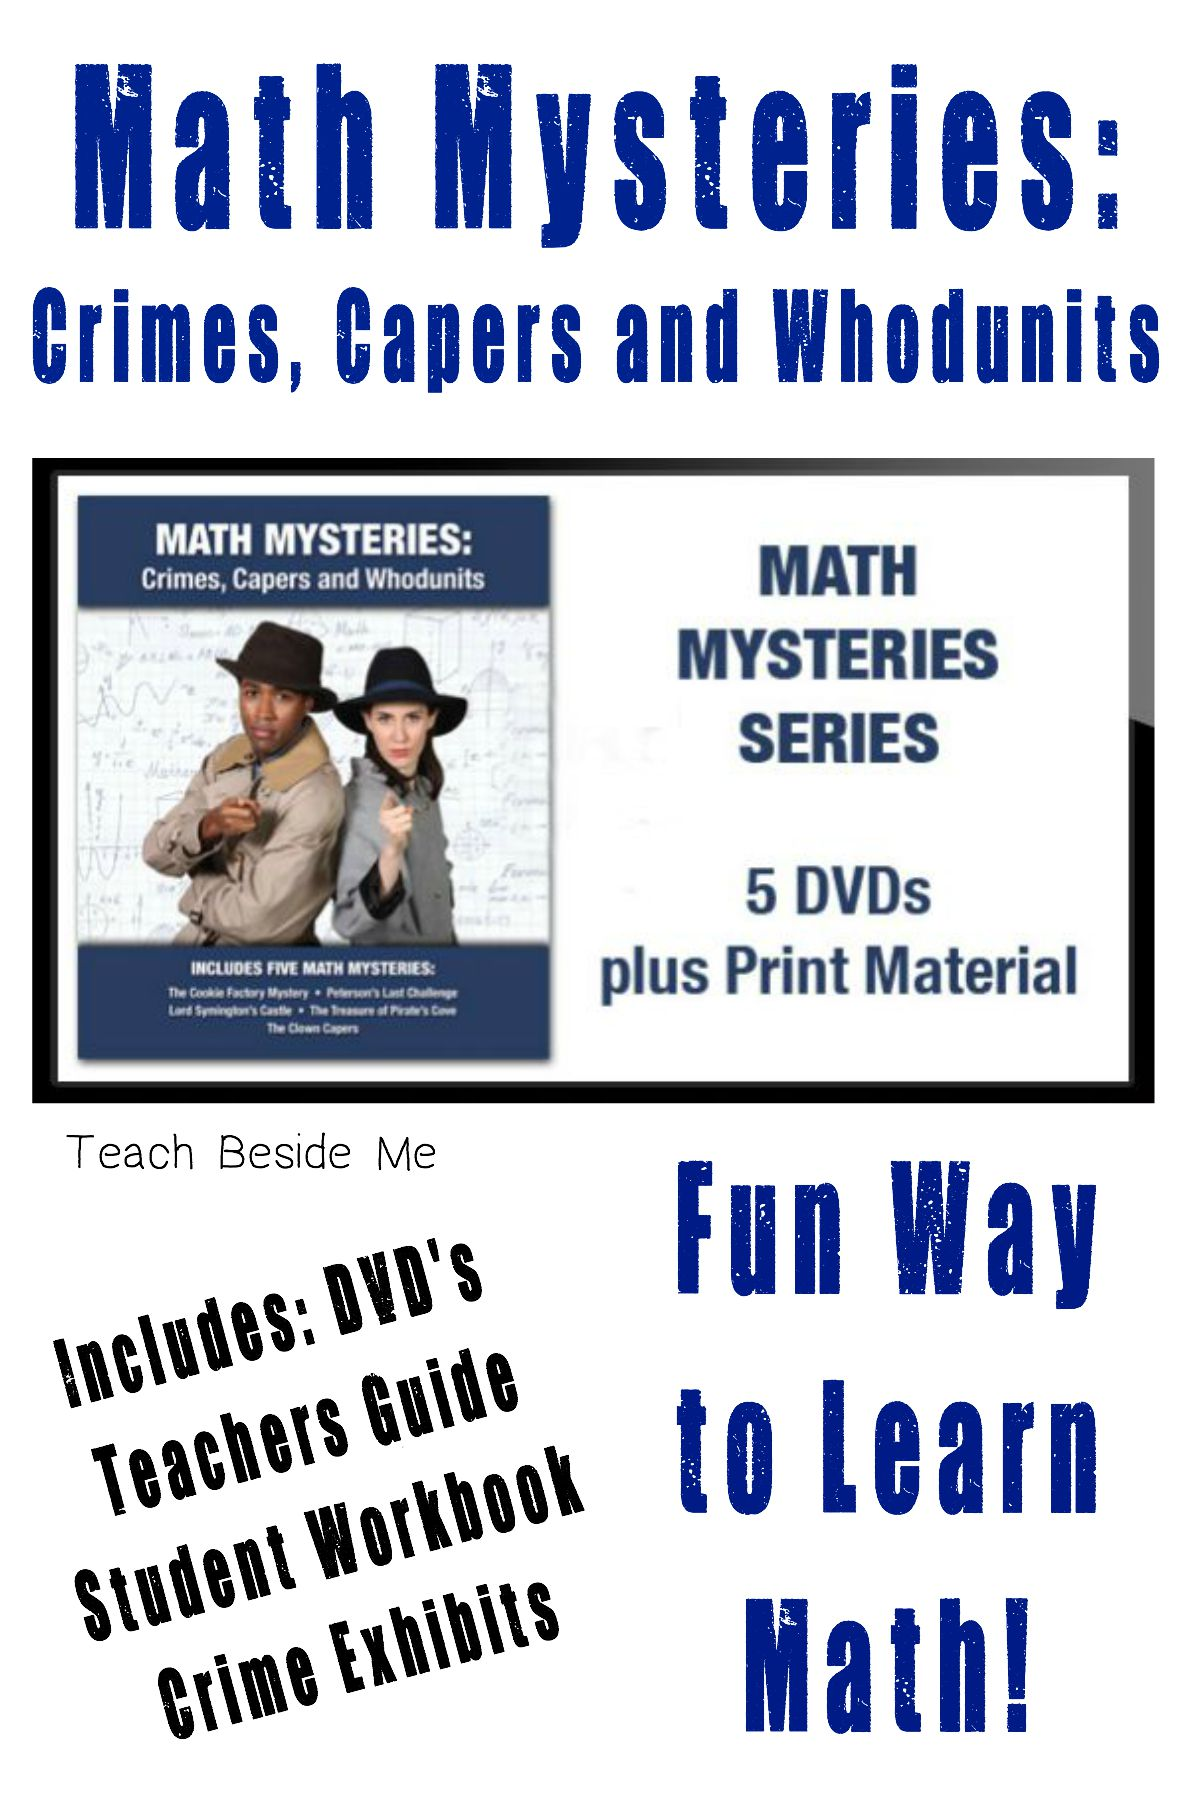 Math Mysteries Series